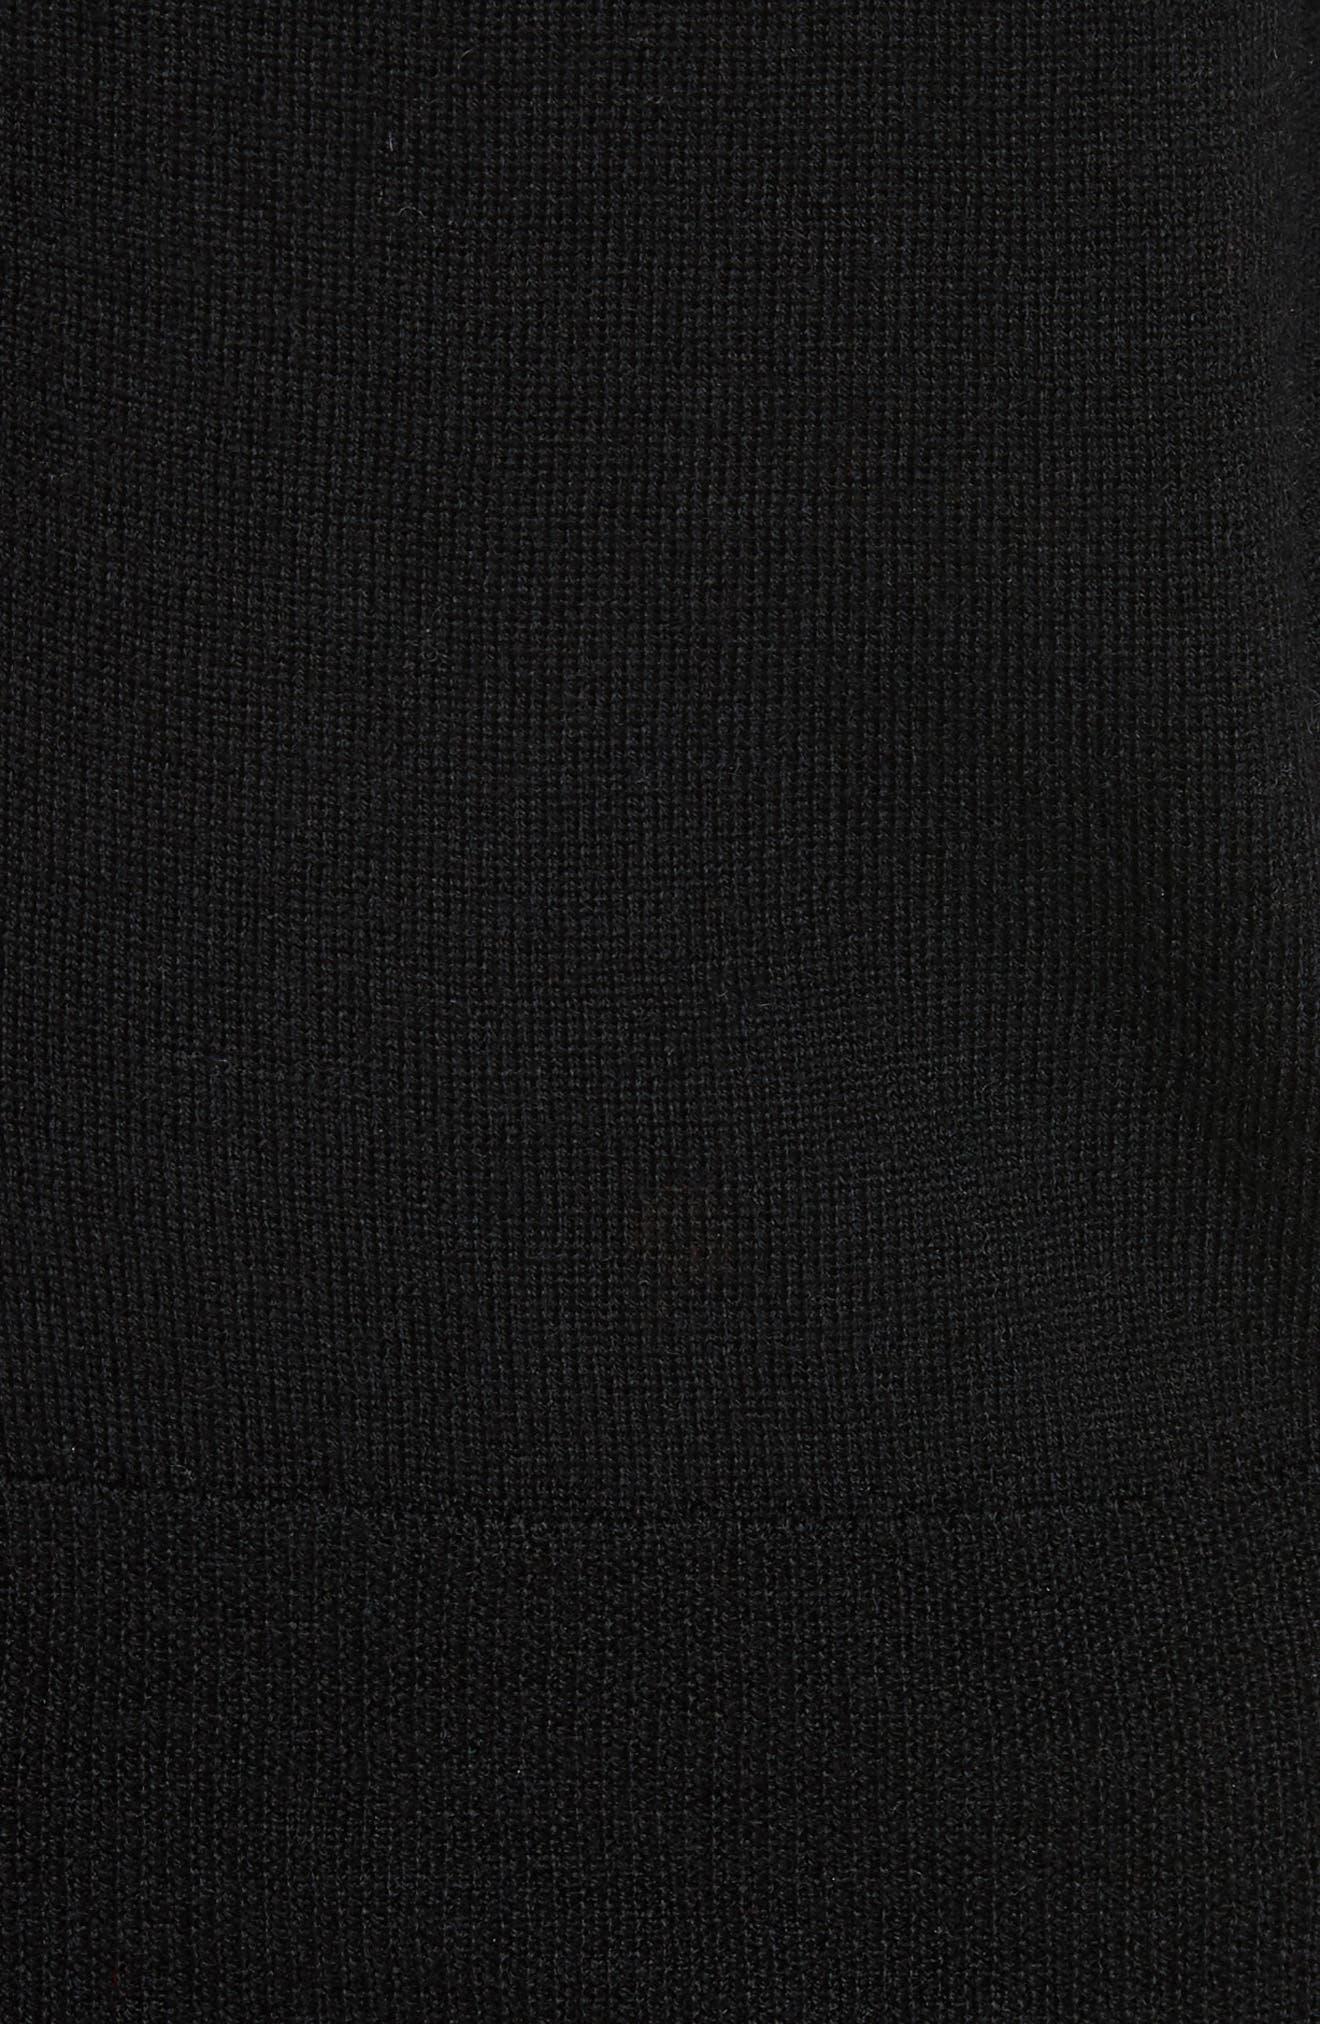 Primrose Embroidered Back Cardigan,                             Alternate thumbnail 5, color,                             006